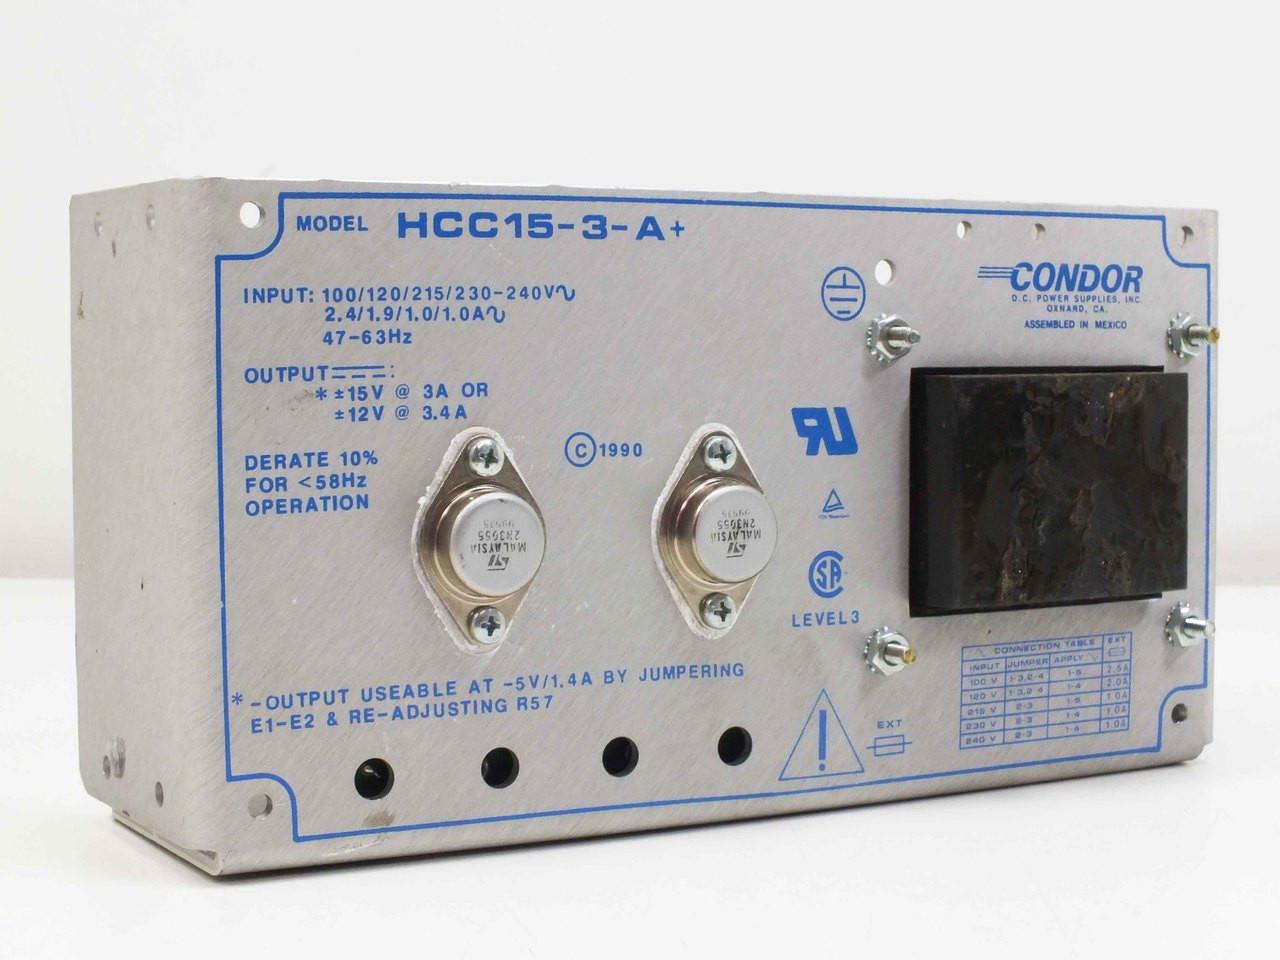 Condor Hcc15 3 Aplus Dc Dual Power Supply 15vdc 3a 12vdc 34a A